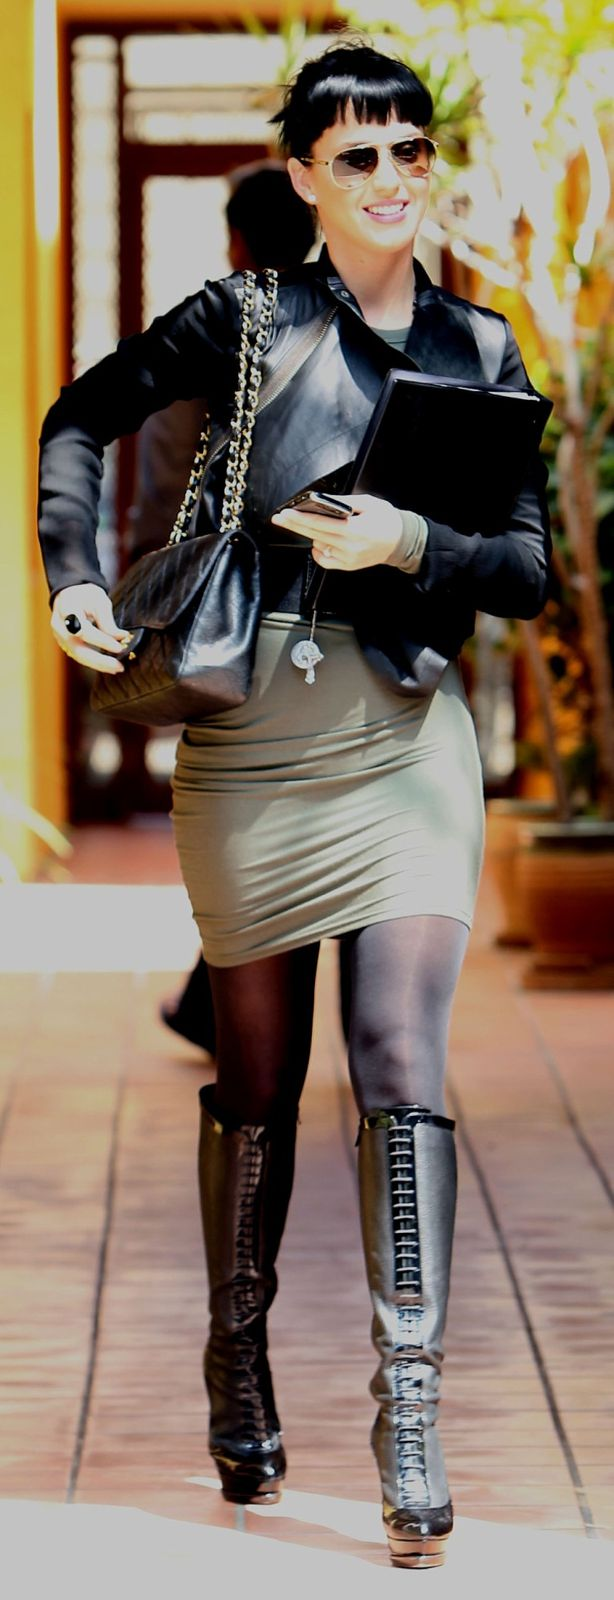 Katy Perry (Singer) - ...